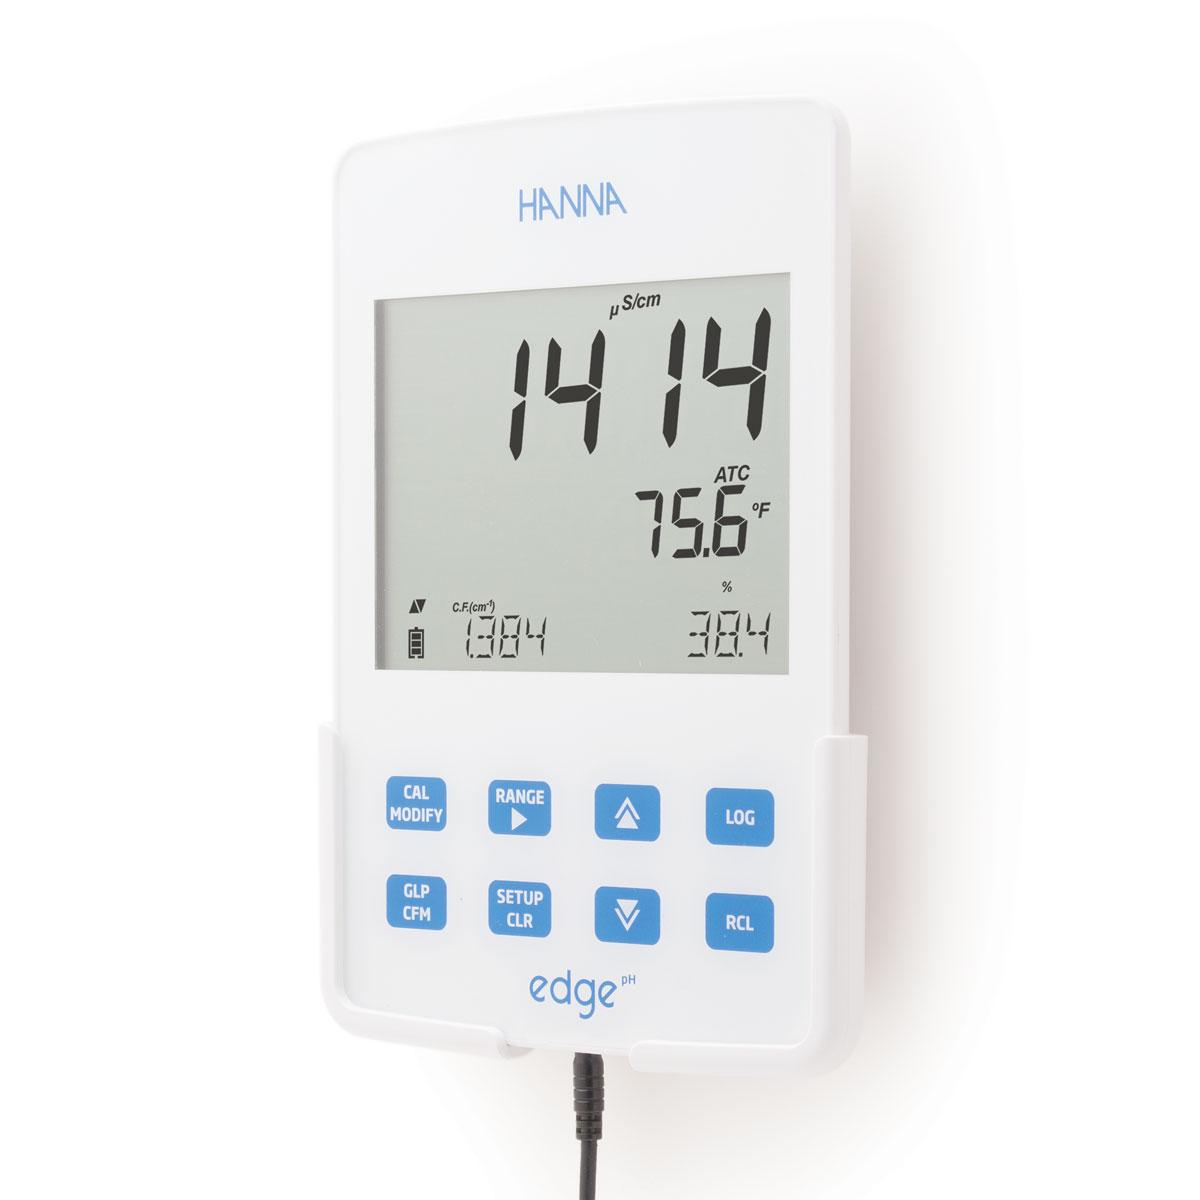 hi2002 edge Conductivity/TDS/Salinity meter wall mount